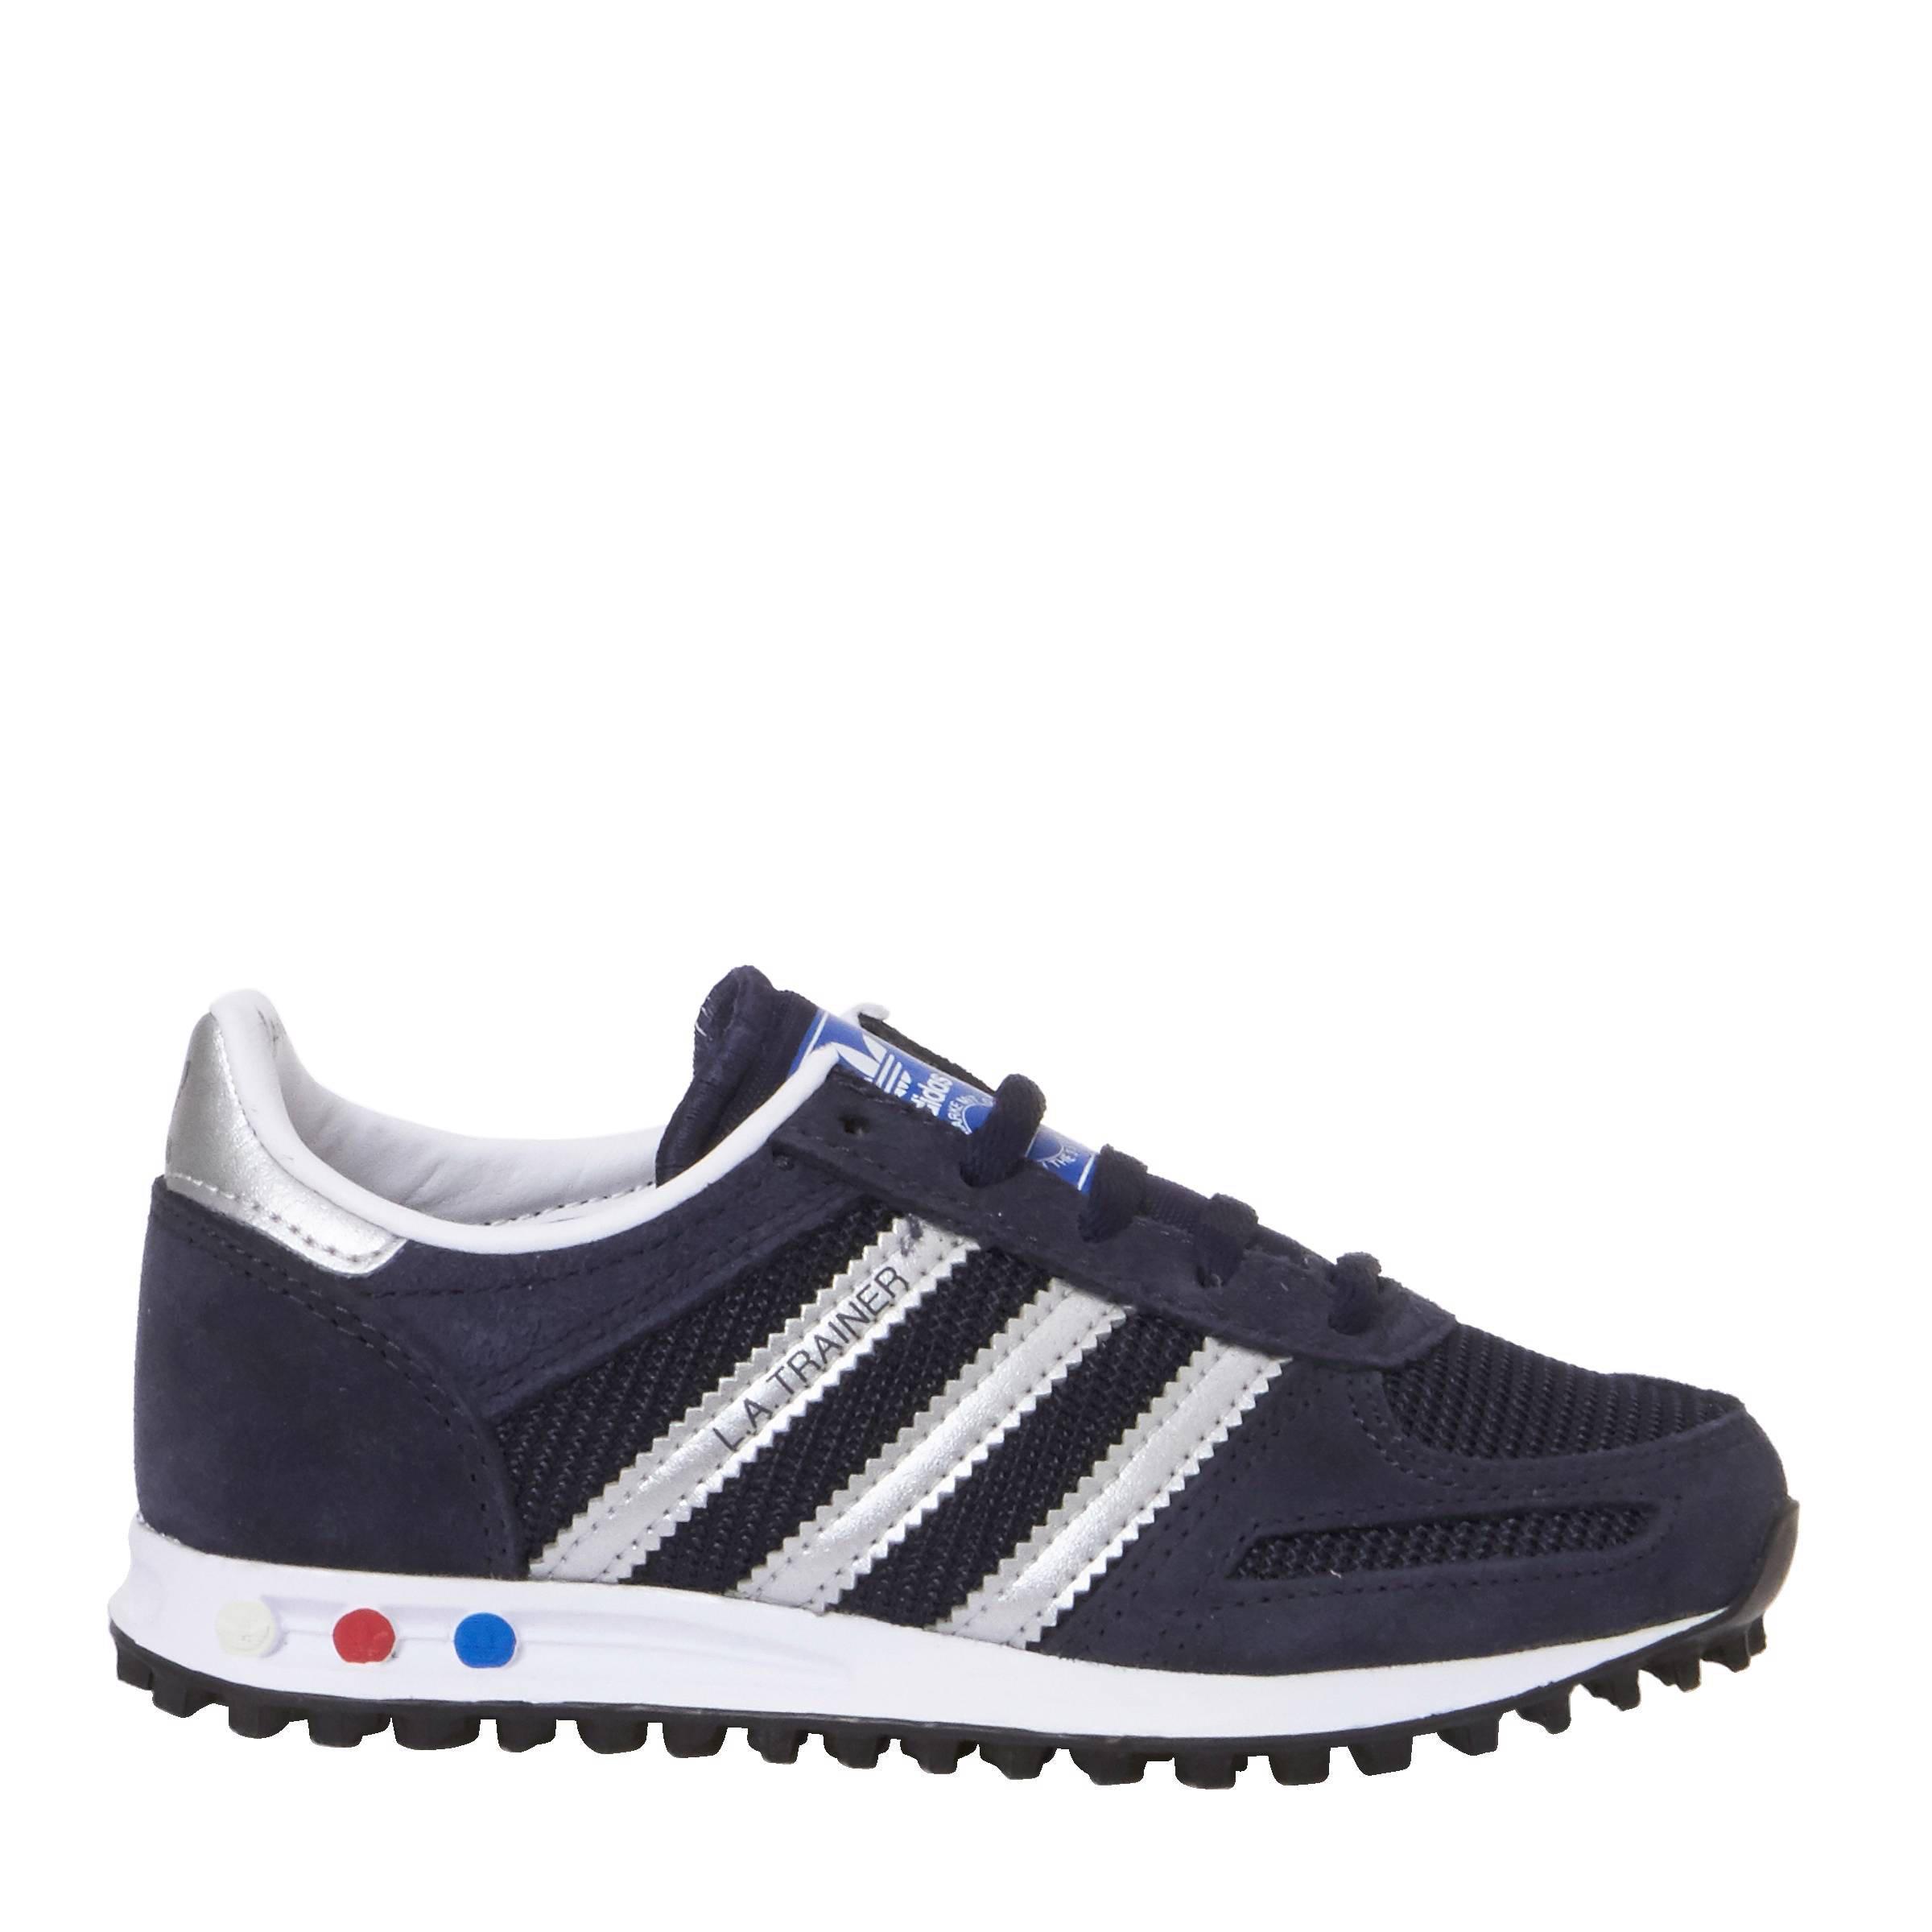 Sneakers LA Trainer Cf I by Adidas Originals